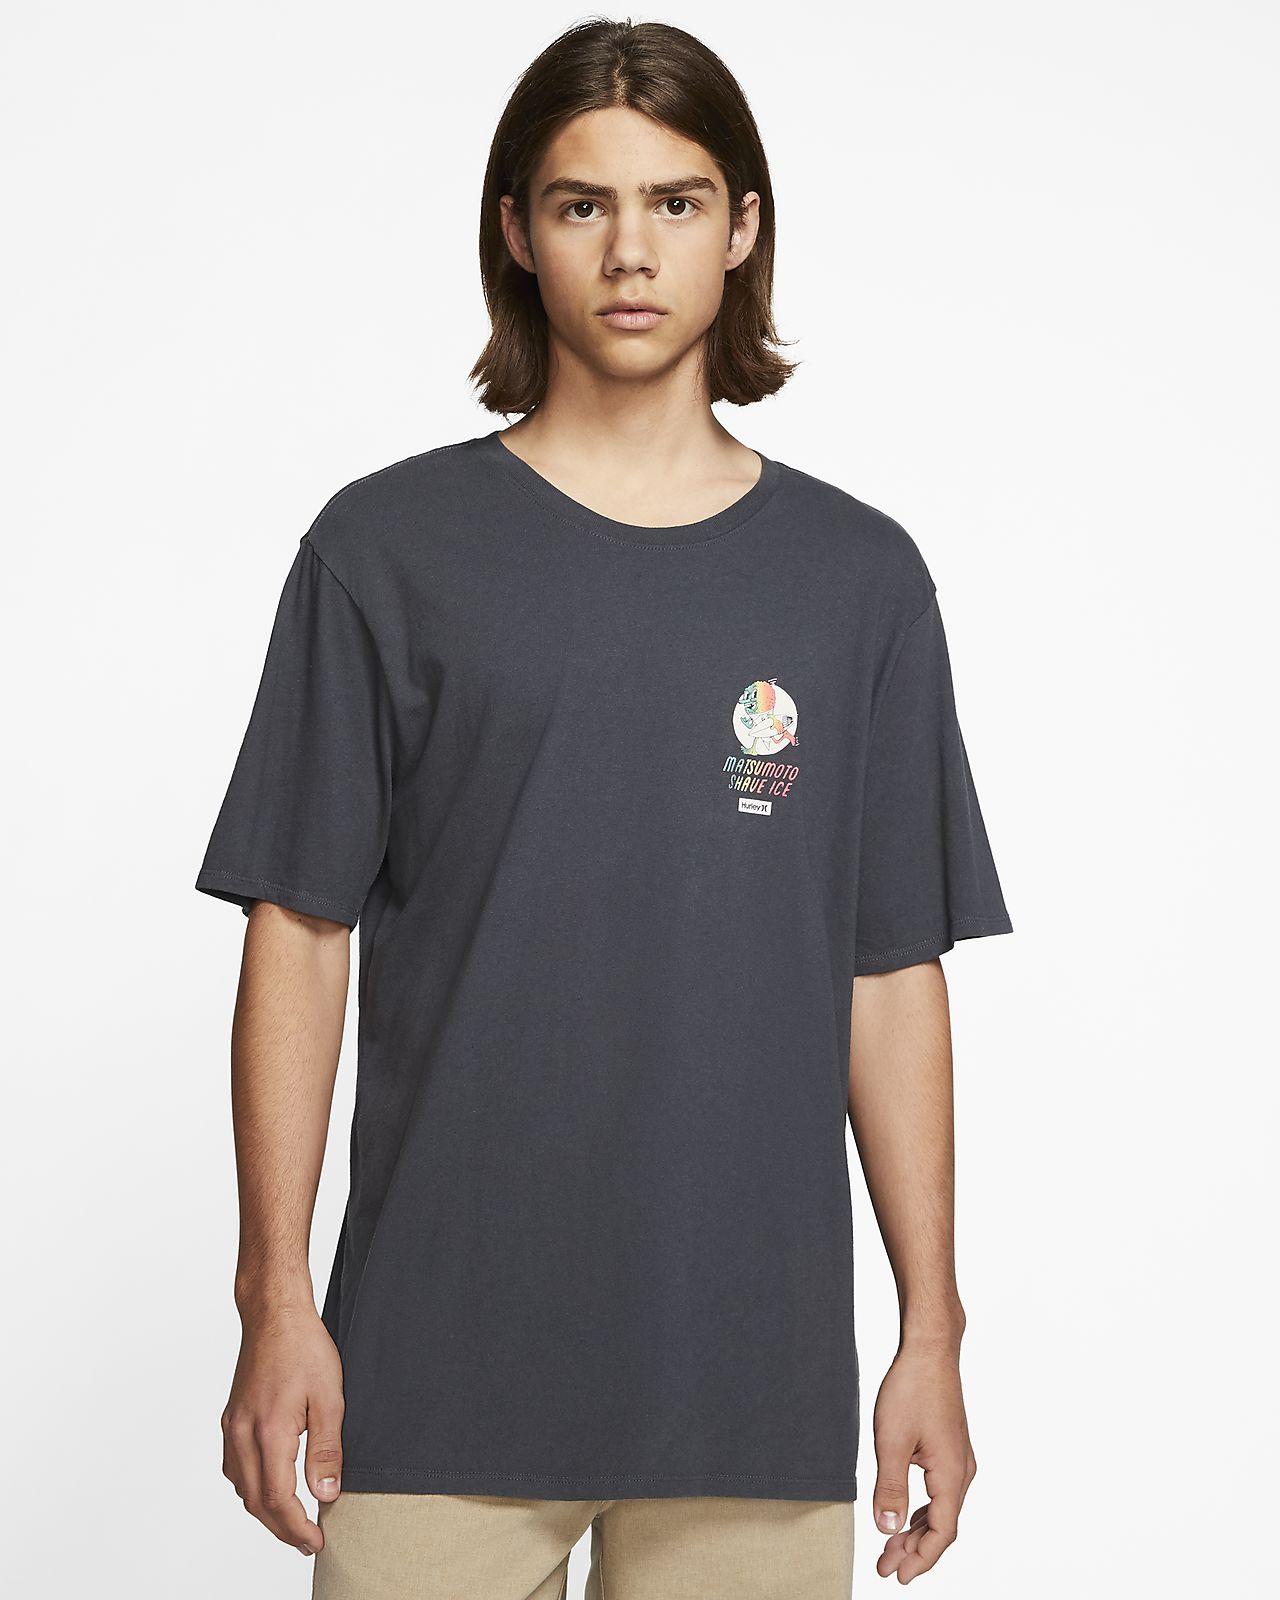 T-shirt męski Hurley x Matsumoto Shave Ice